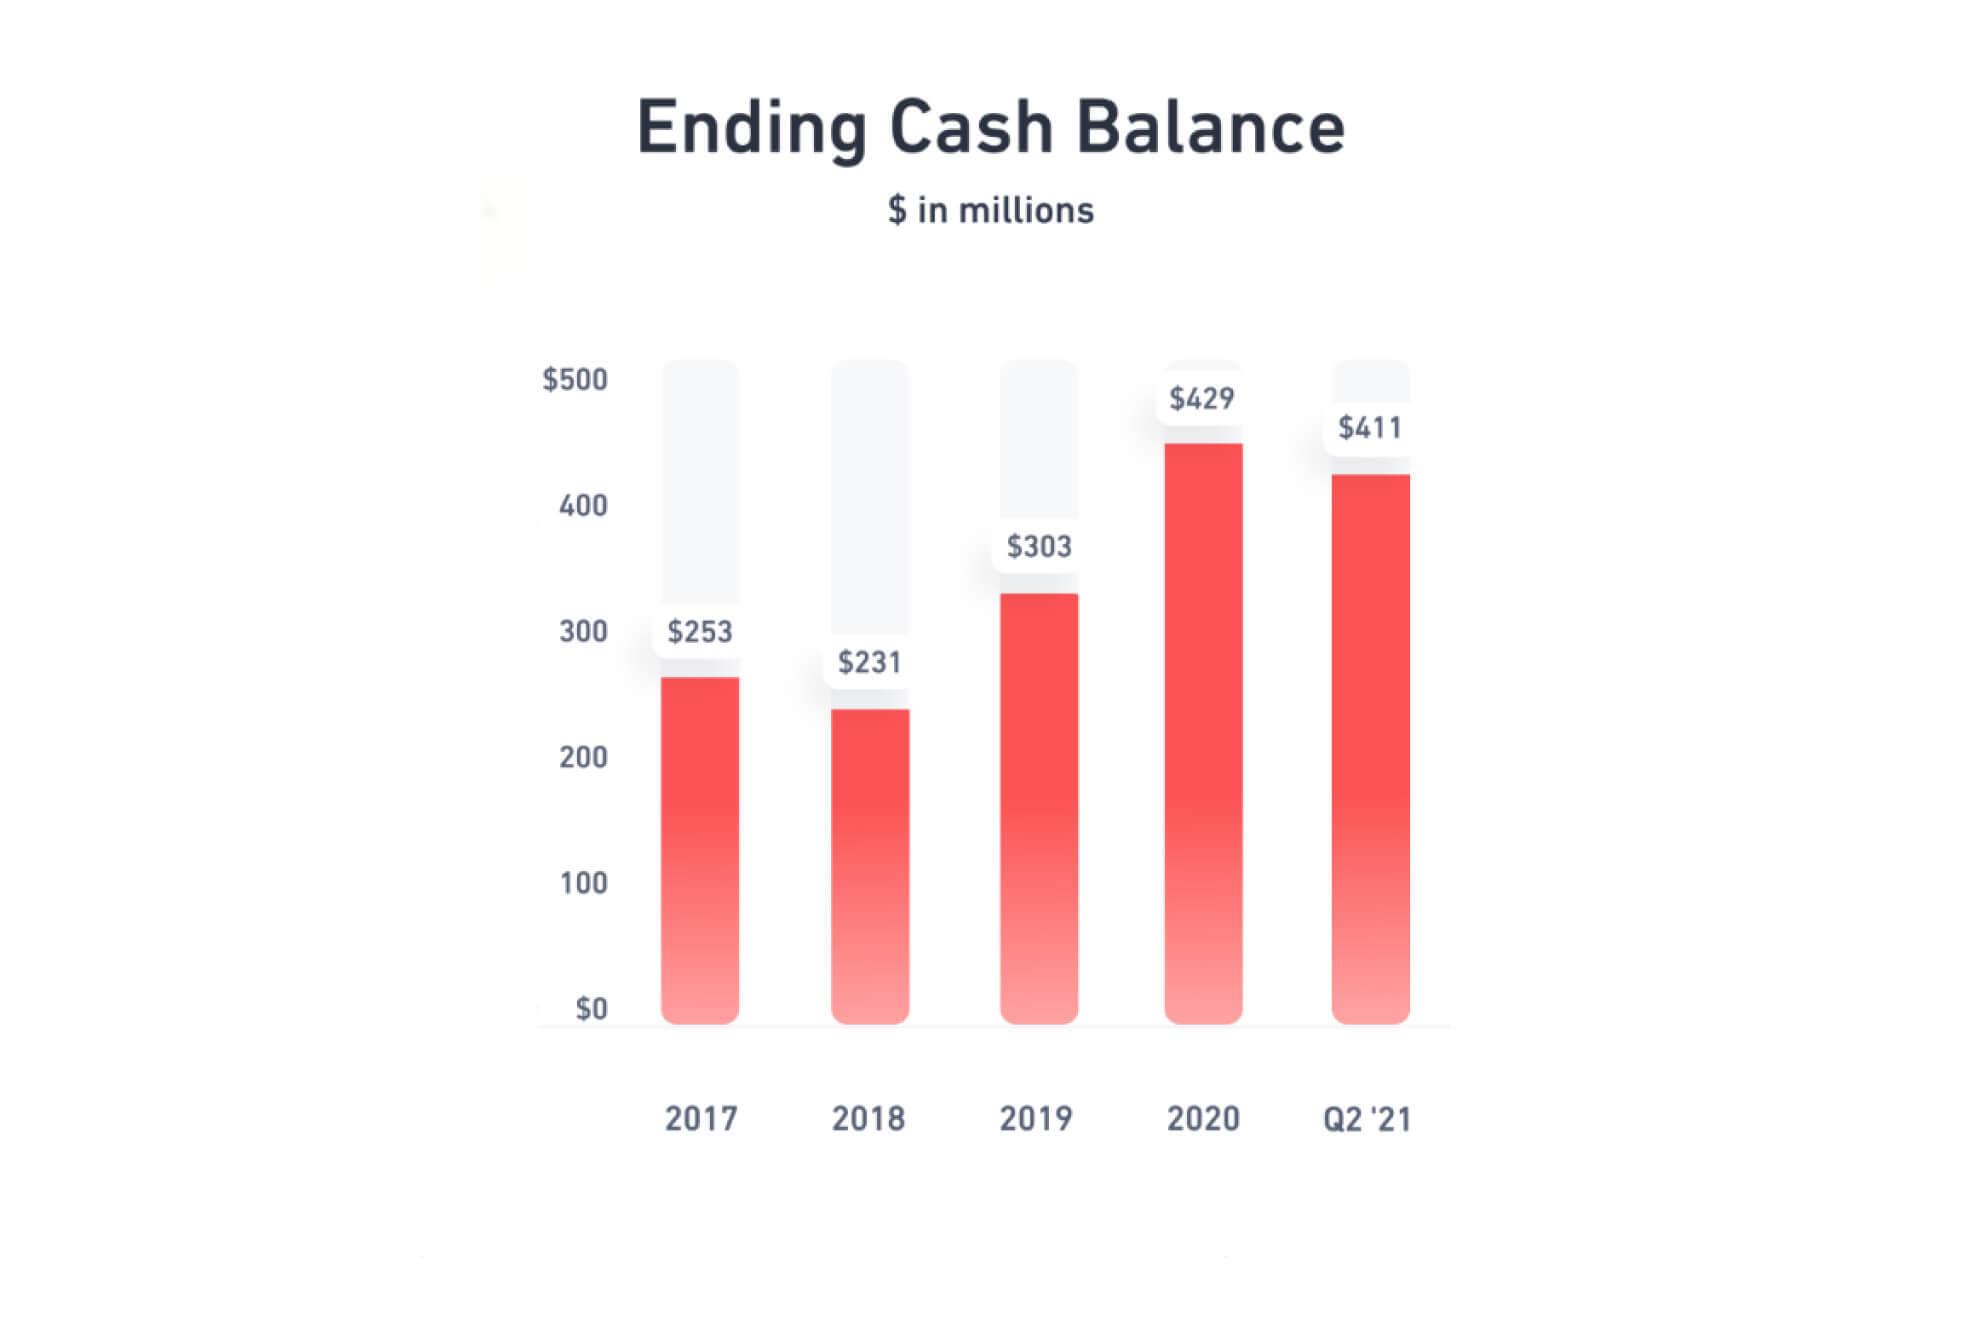 Ending Cash Balance